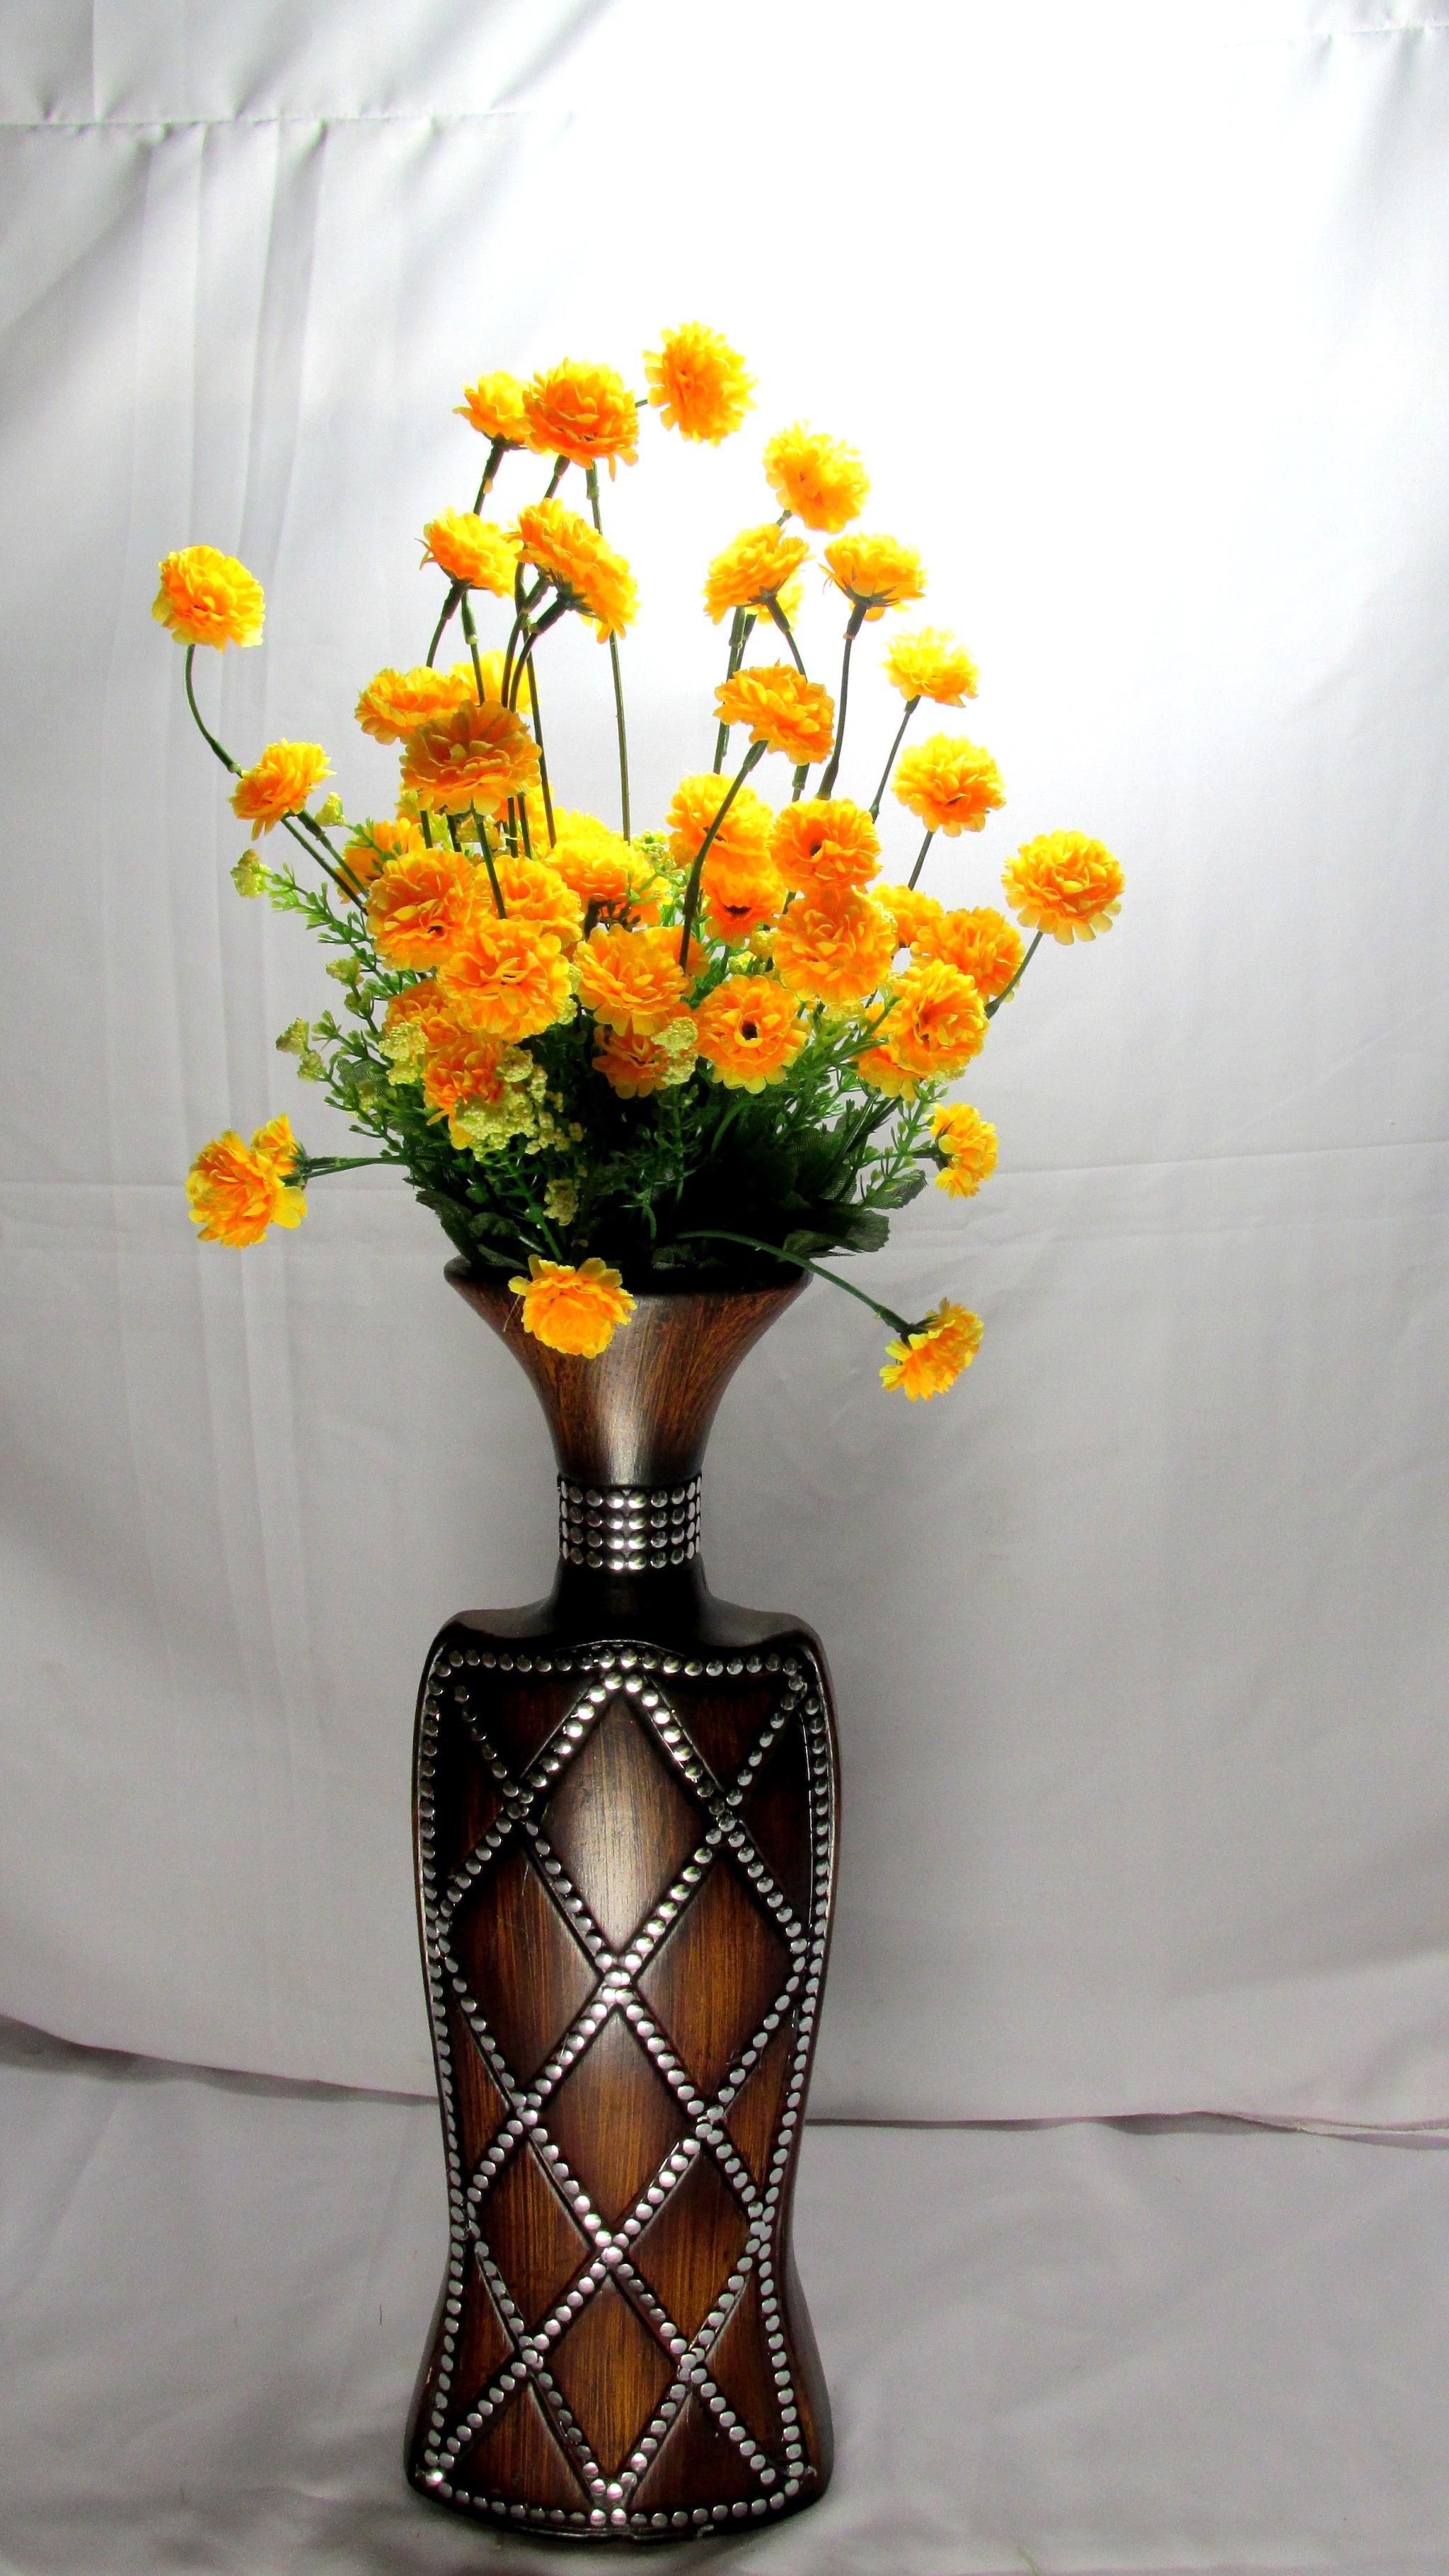 Artificial Carnation Flower Bunch N34C1